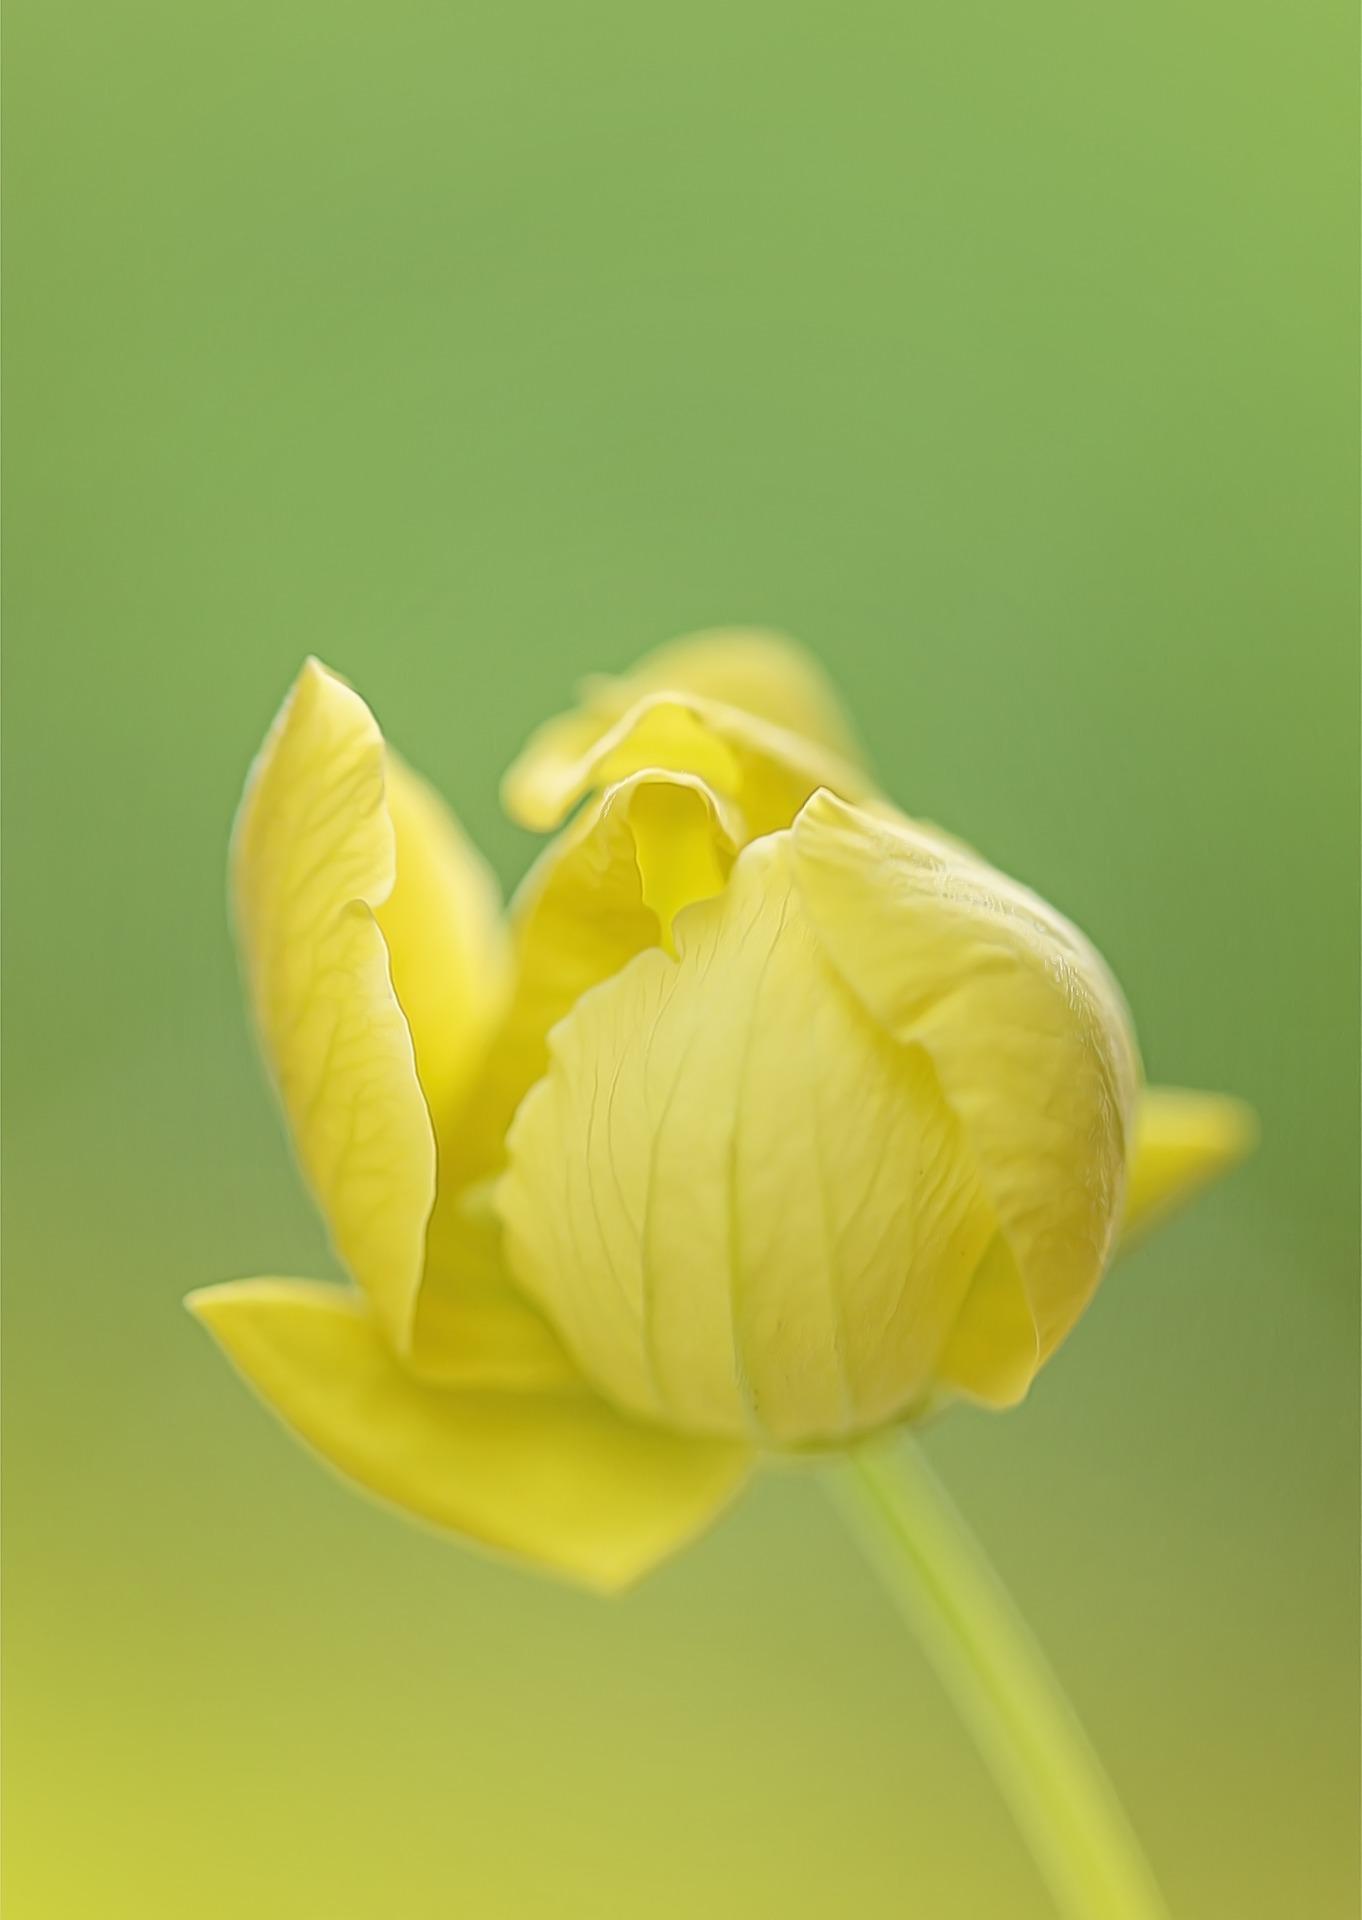 yellow-flower-1177155_1920